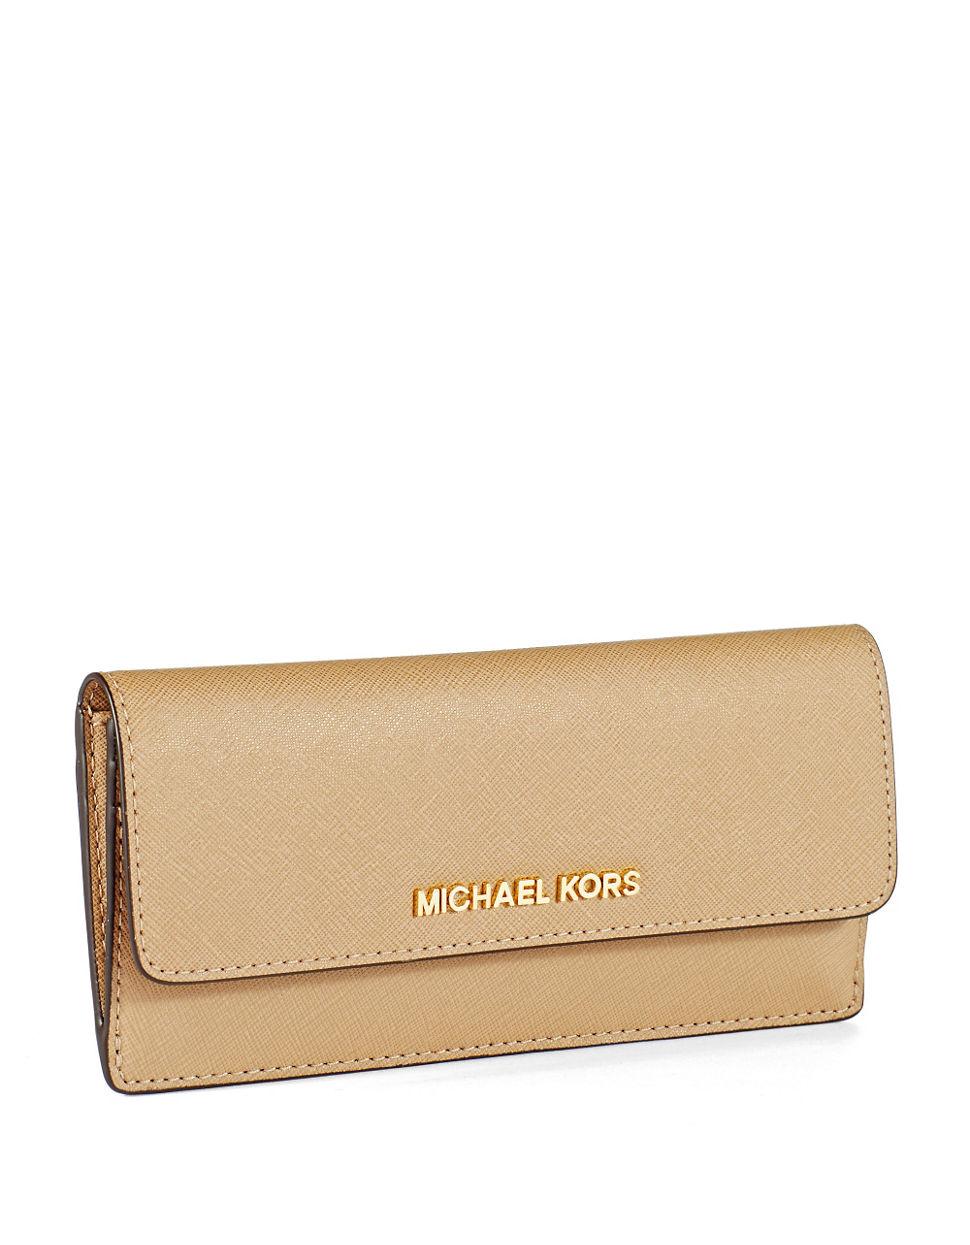 8e0183fb6c81 MICHAEL Michael Kors Jet Set Leather Travel Flat Wallet in Natural ...